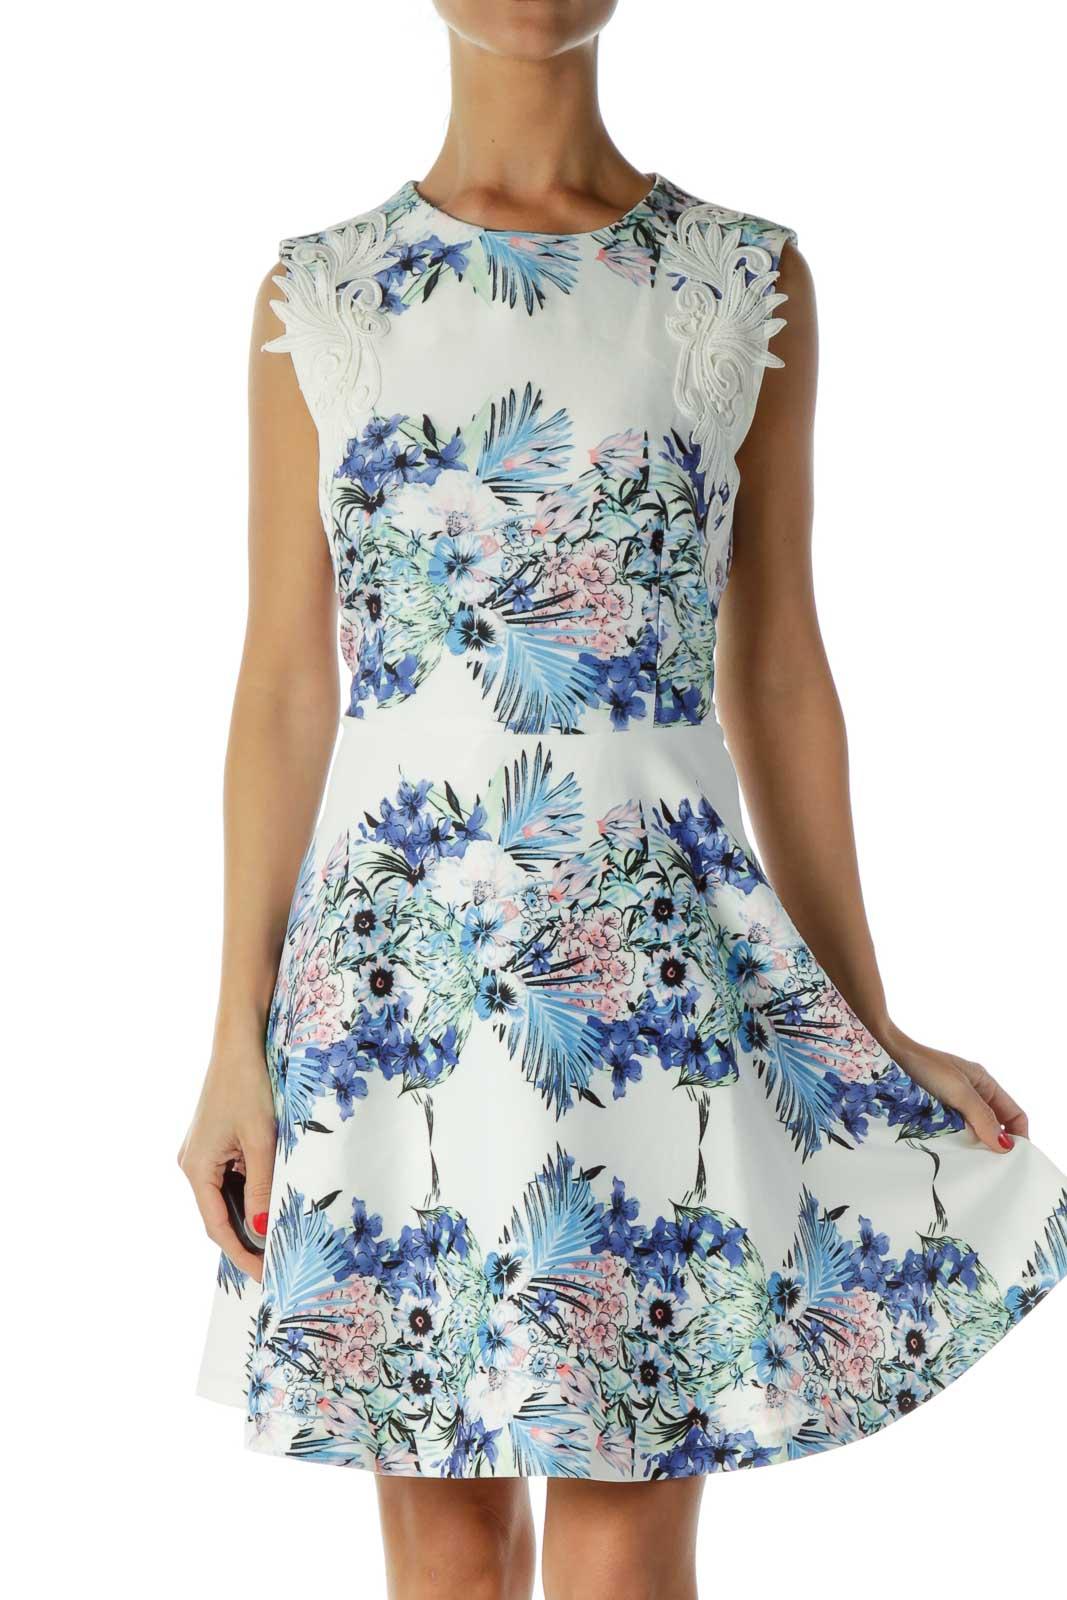 White Blue Floral Print Cocktail Dress Front